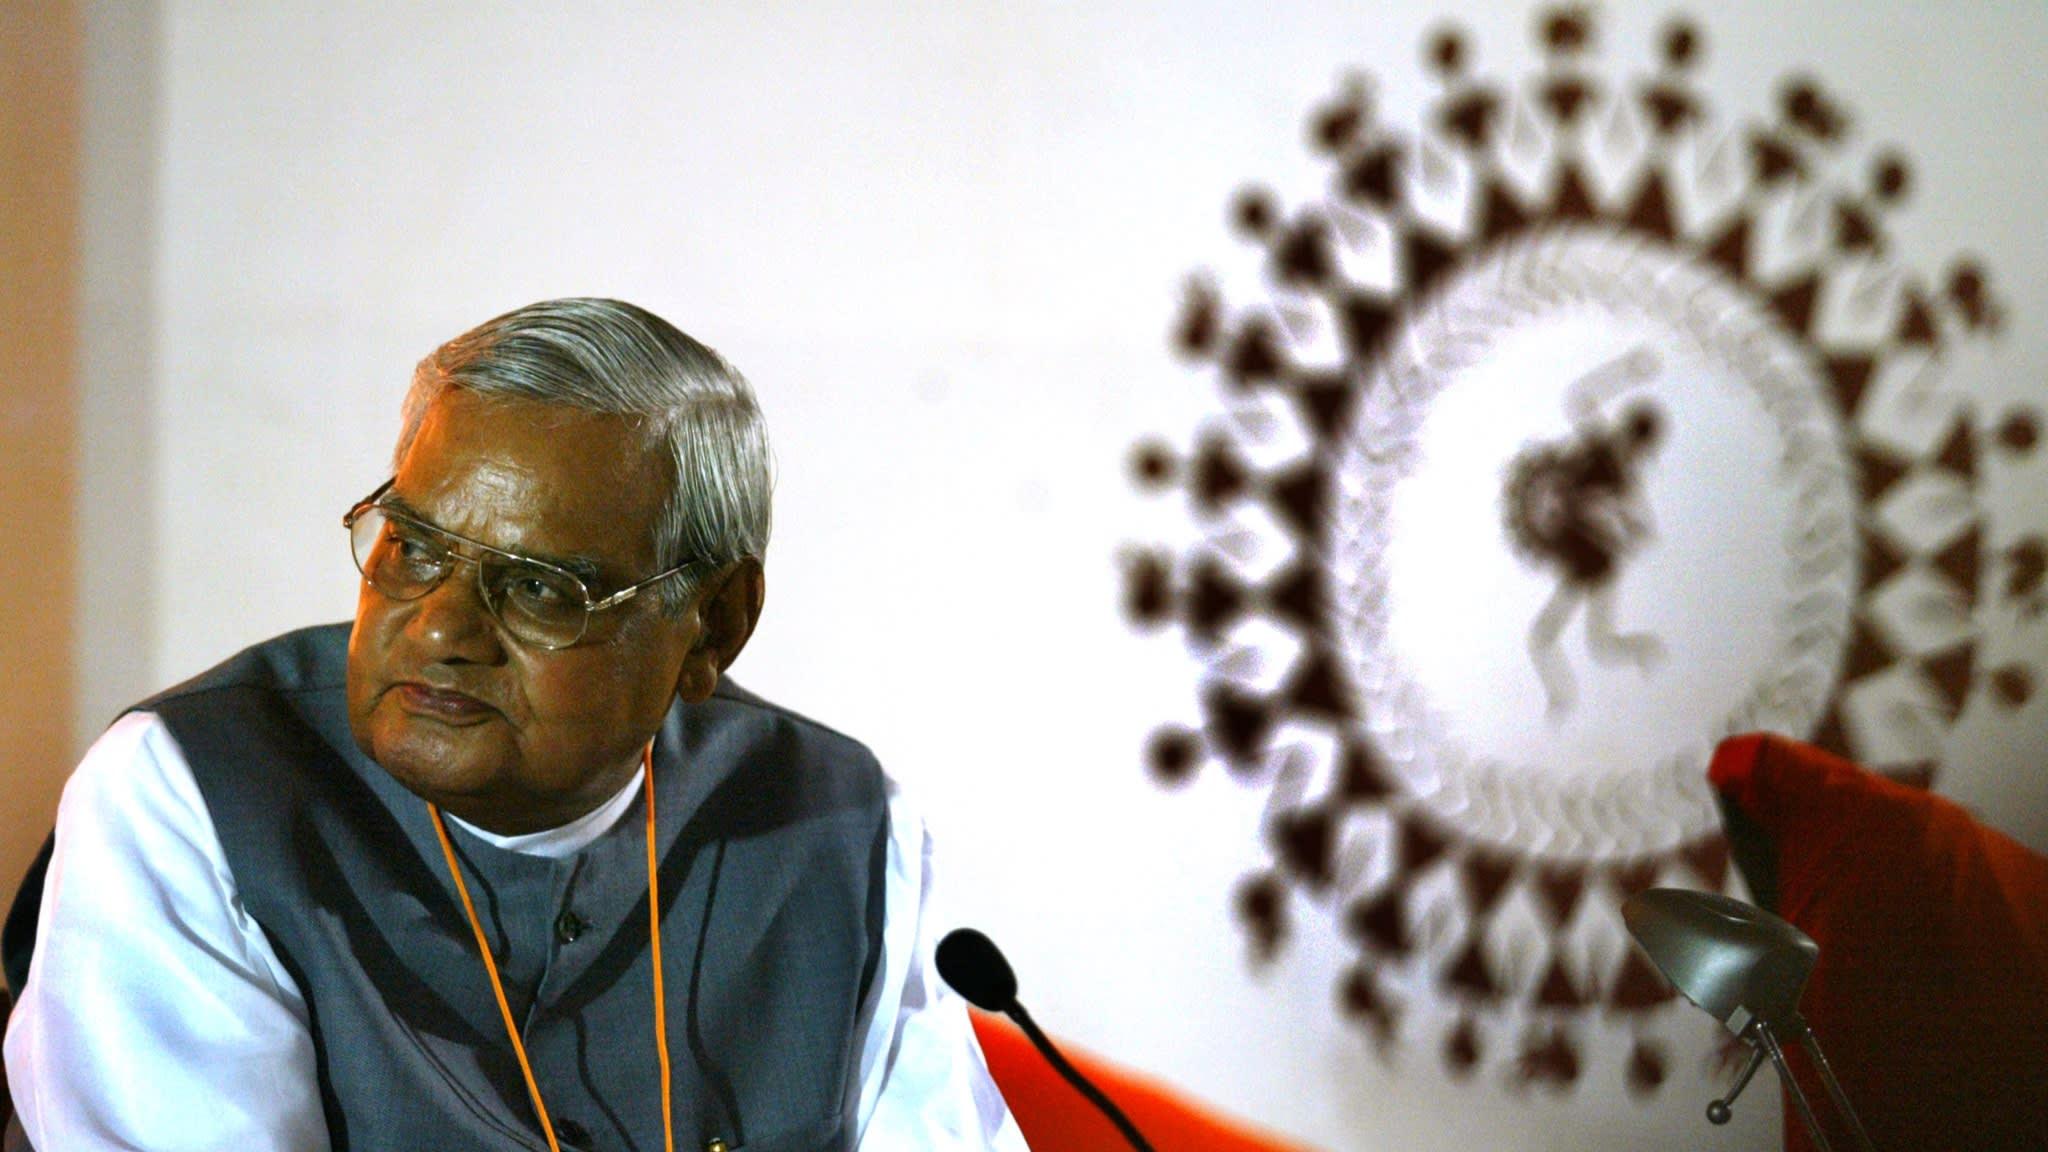 Atal Bihari Vajpayee Reuters Files